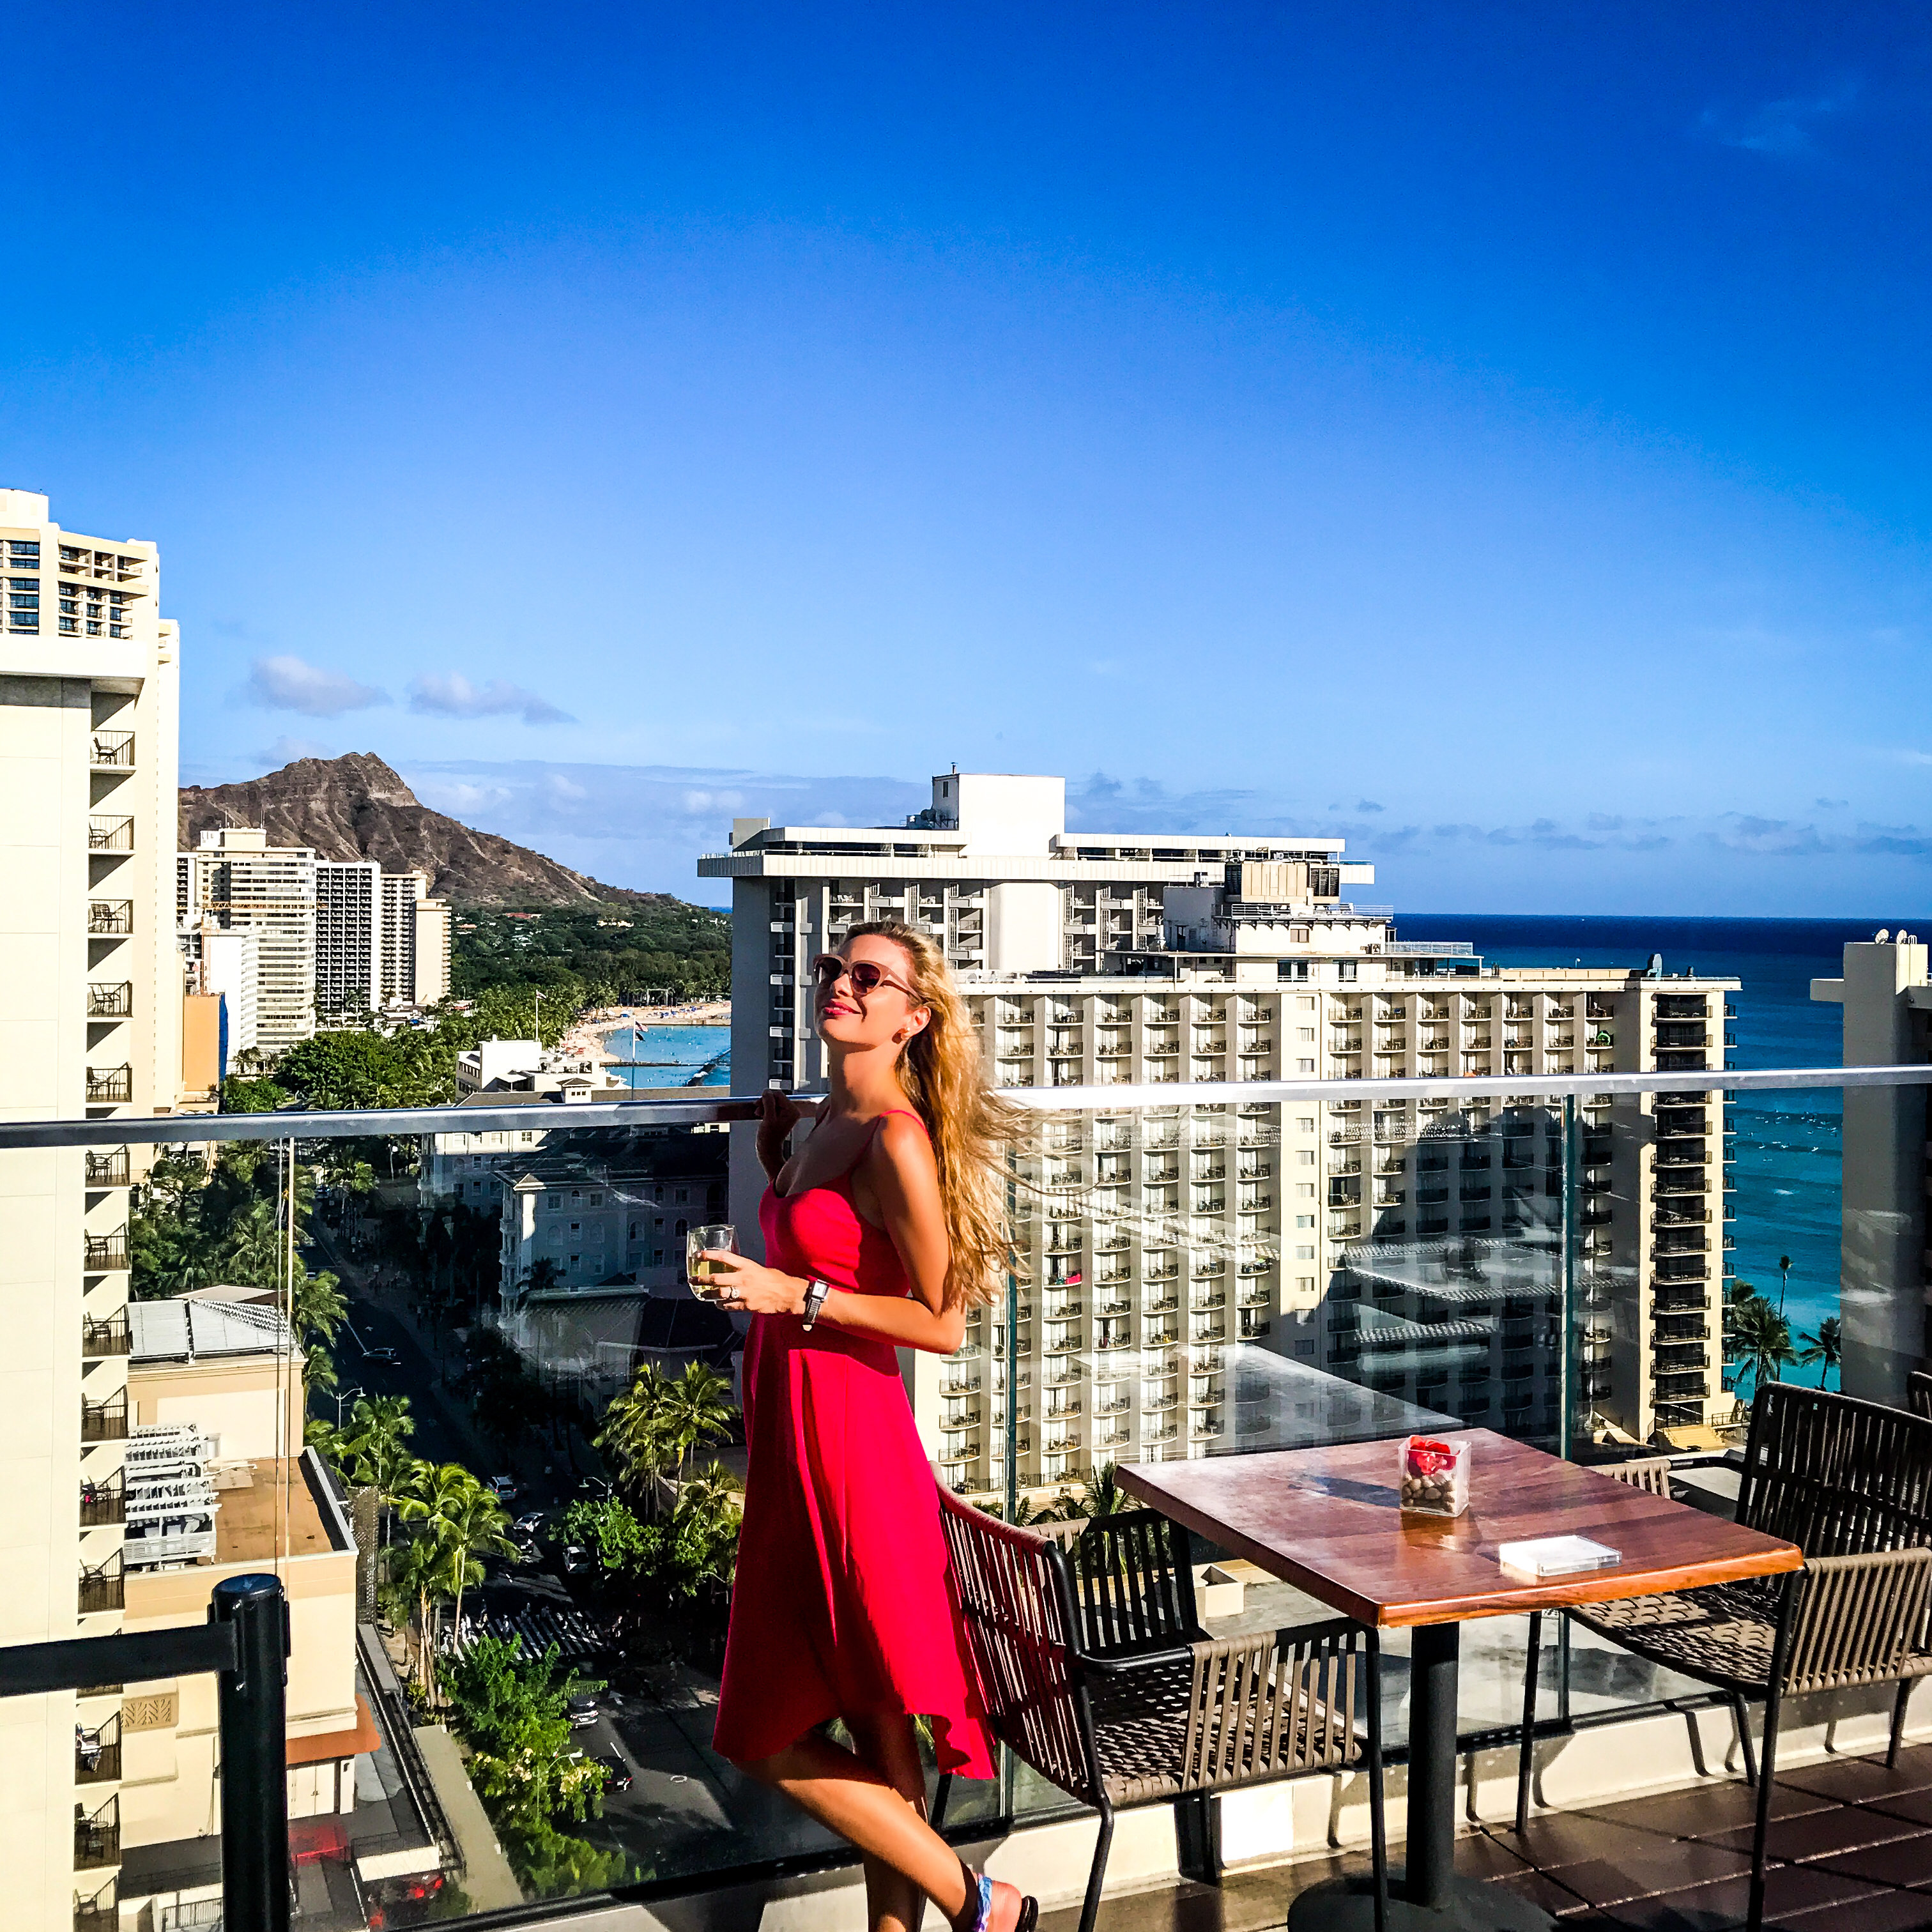 Oahu Hawaii BubblyMoments BestPlacestoVisitinOahuHawaii()